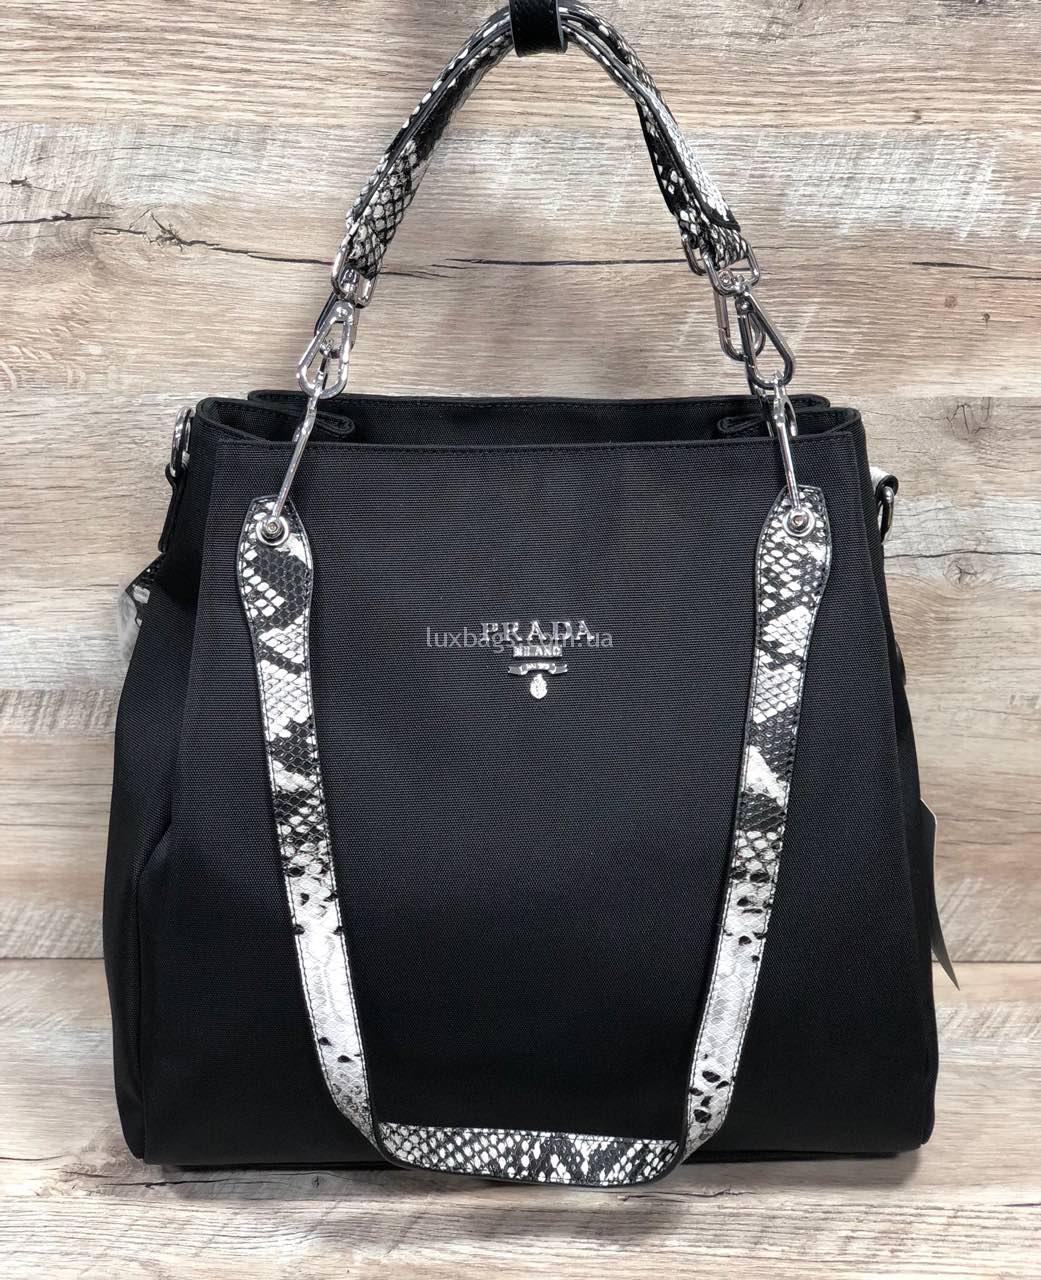 b8edb3a13b24 Женская сумка из плащевка Prada Прада Купить на lux-bags